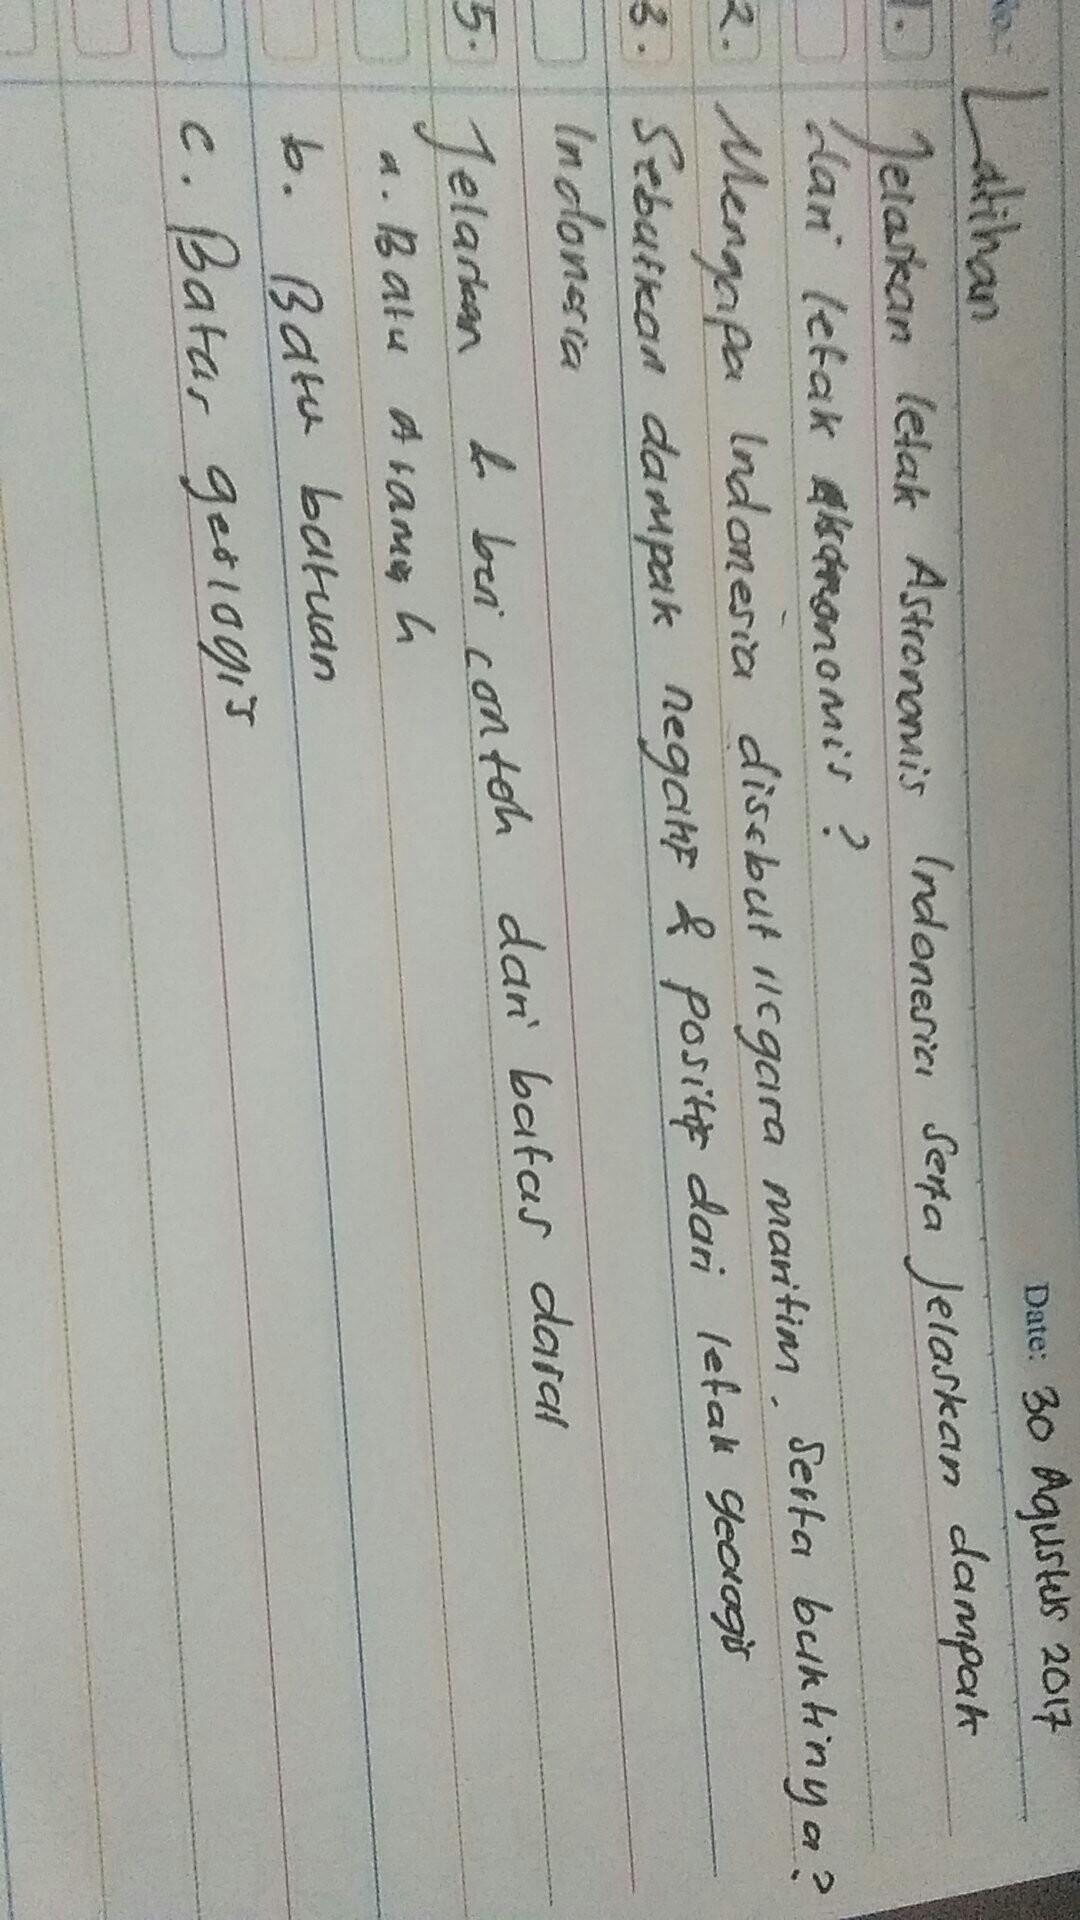 Karakteristik Benua Asia Lengkap (Luas, Letak, Iklim, Ciri